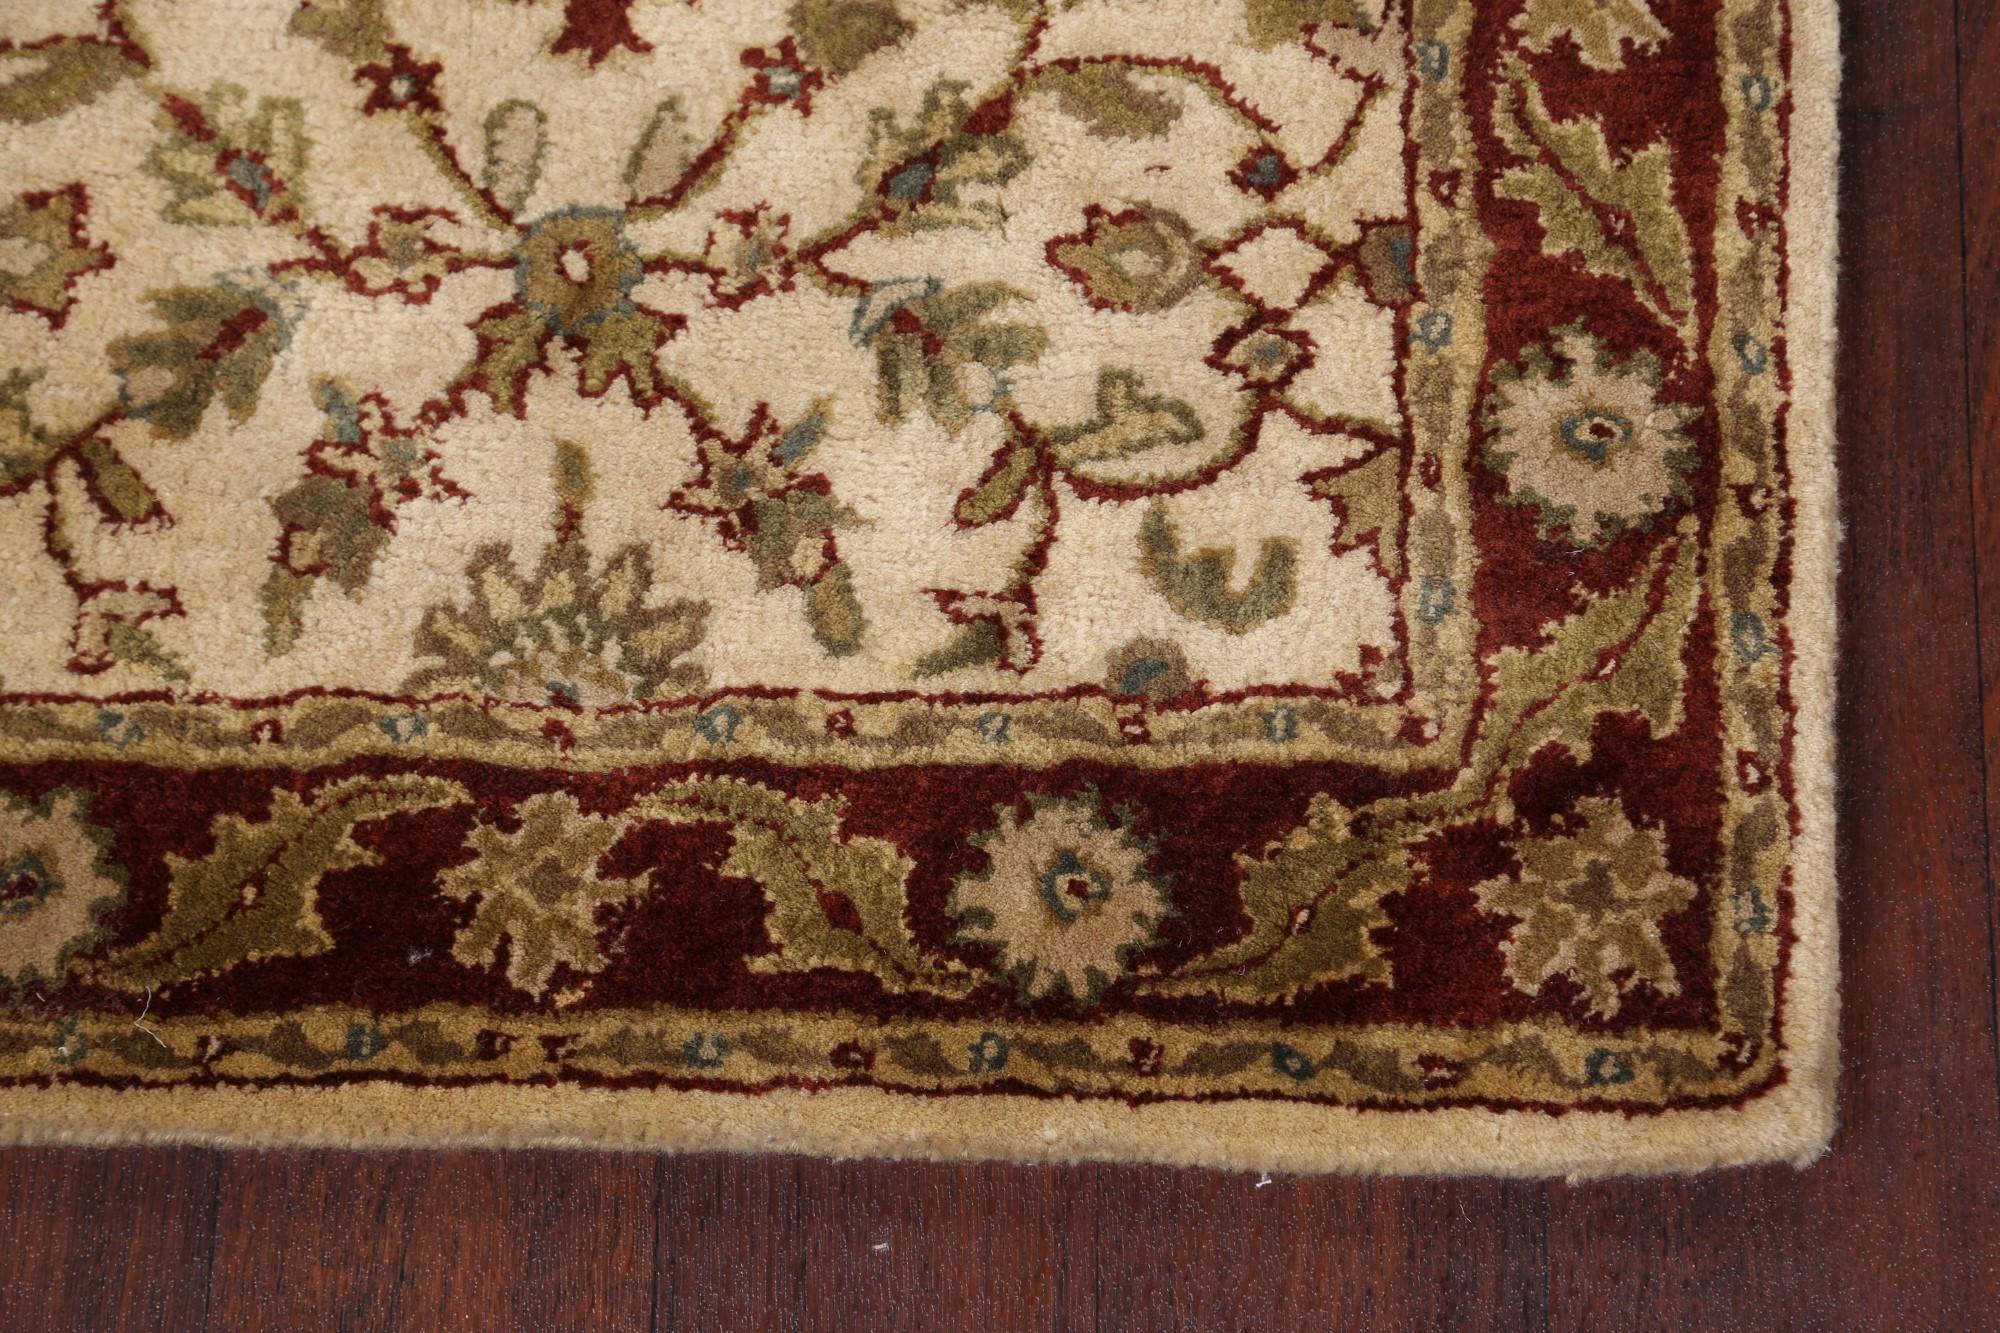 "All-Over Floral DARK BURGUNDY 9 ft Agra Wool Hand-Tufted Runner Rug 9/' 0 x 2/' 6/"""